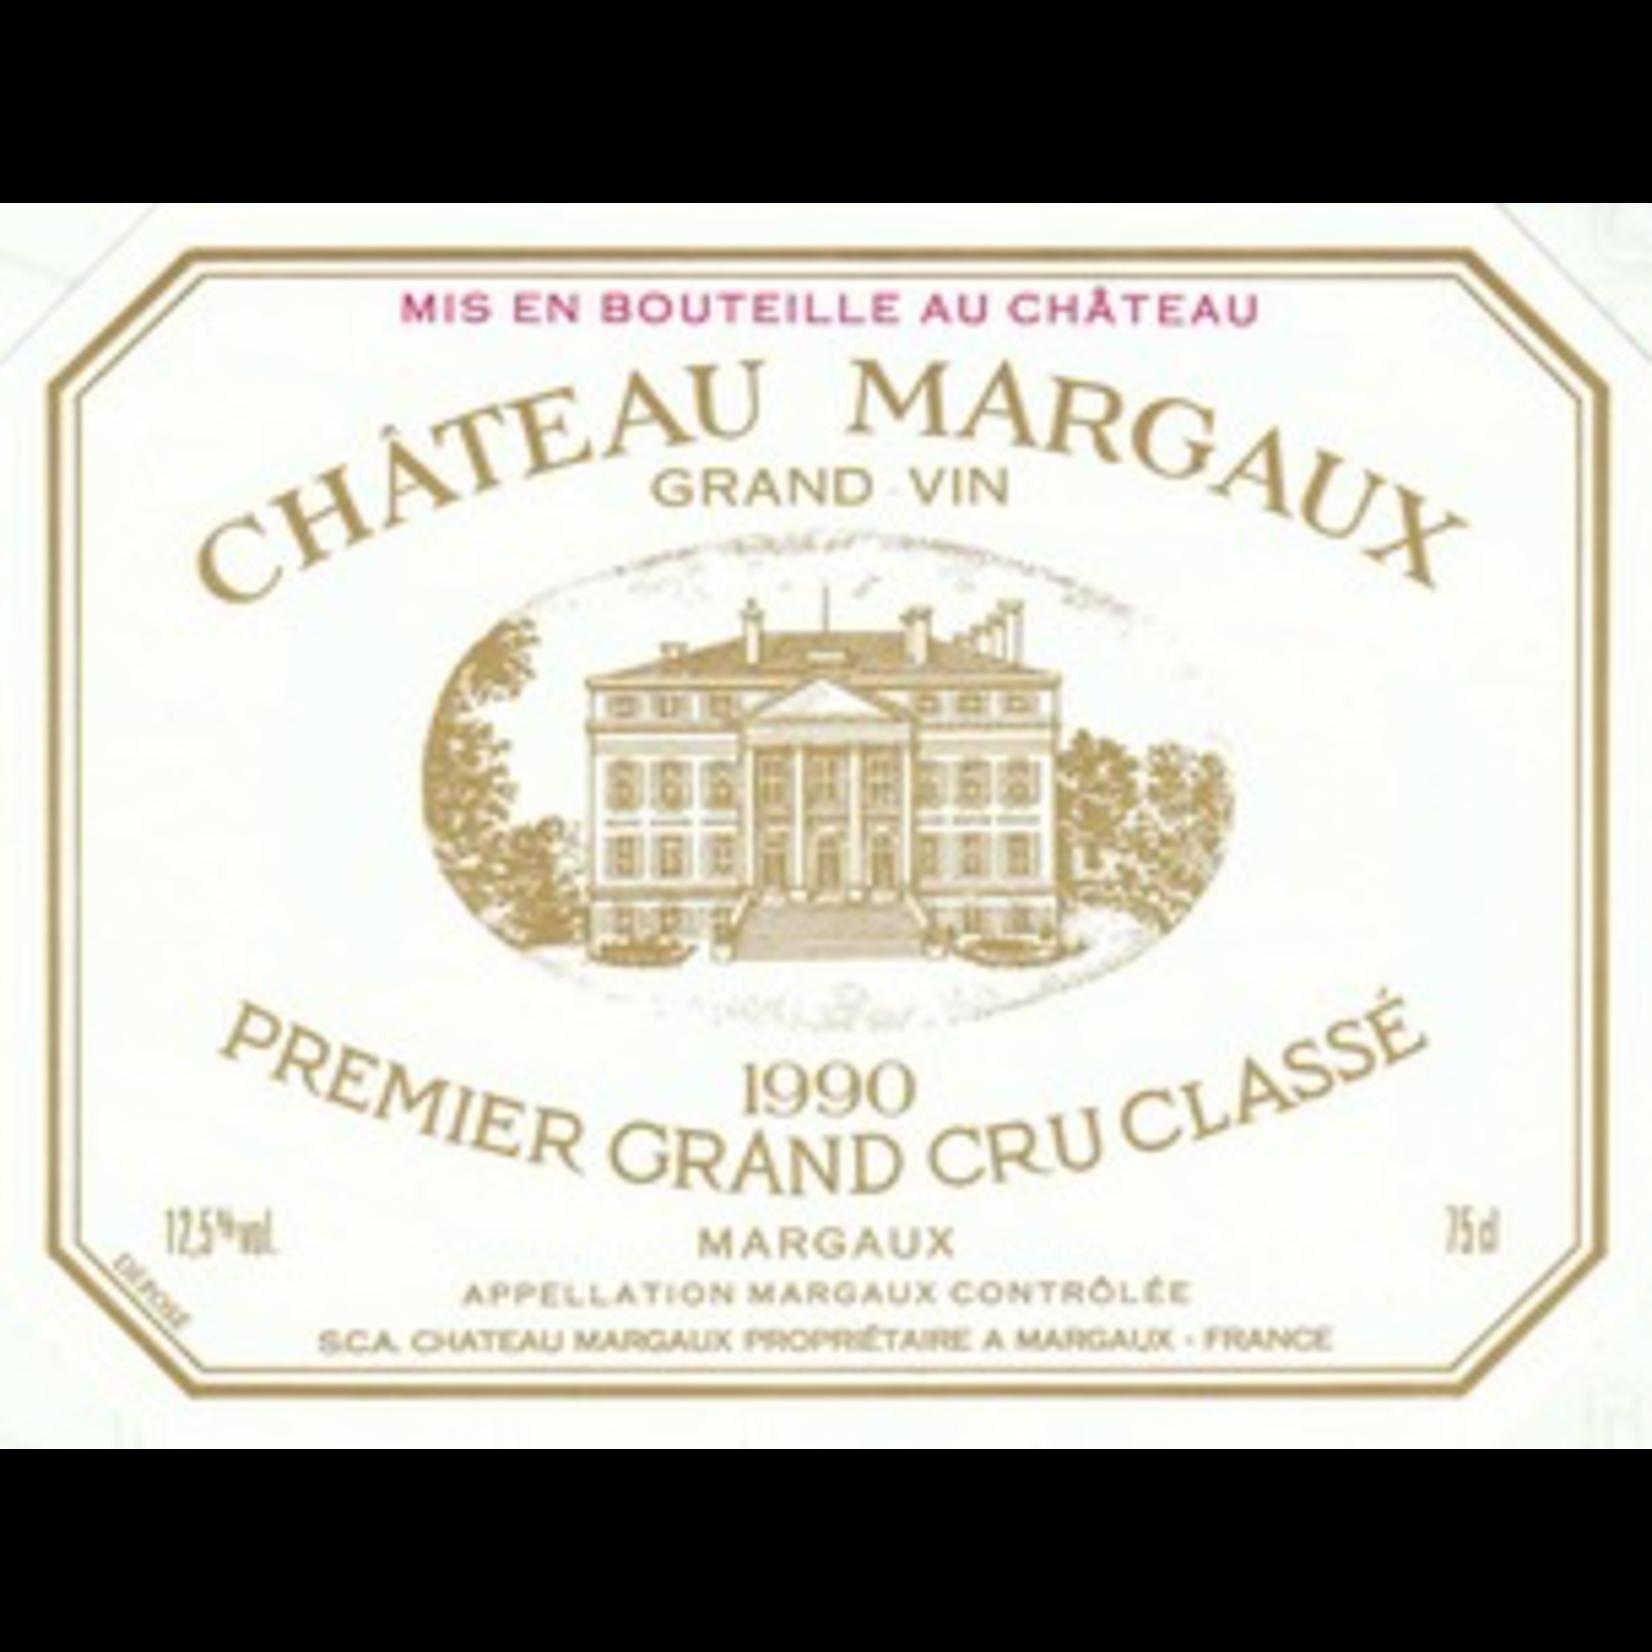 Wine Chateau Margaux 1990